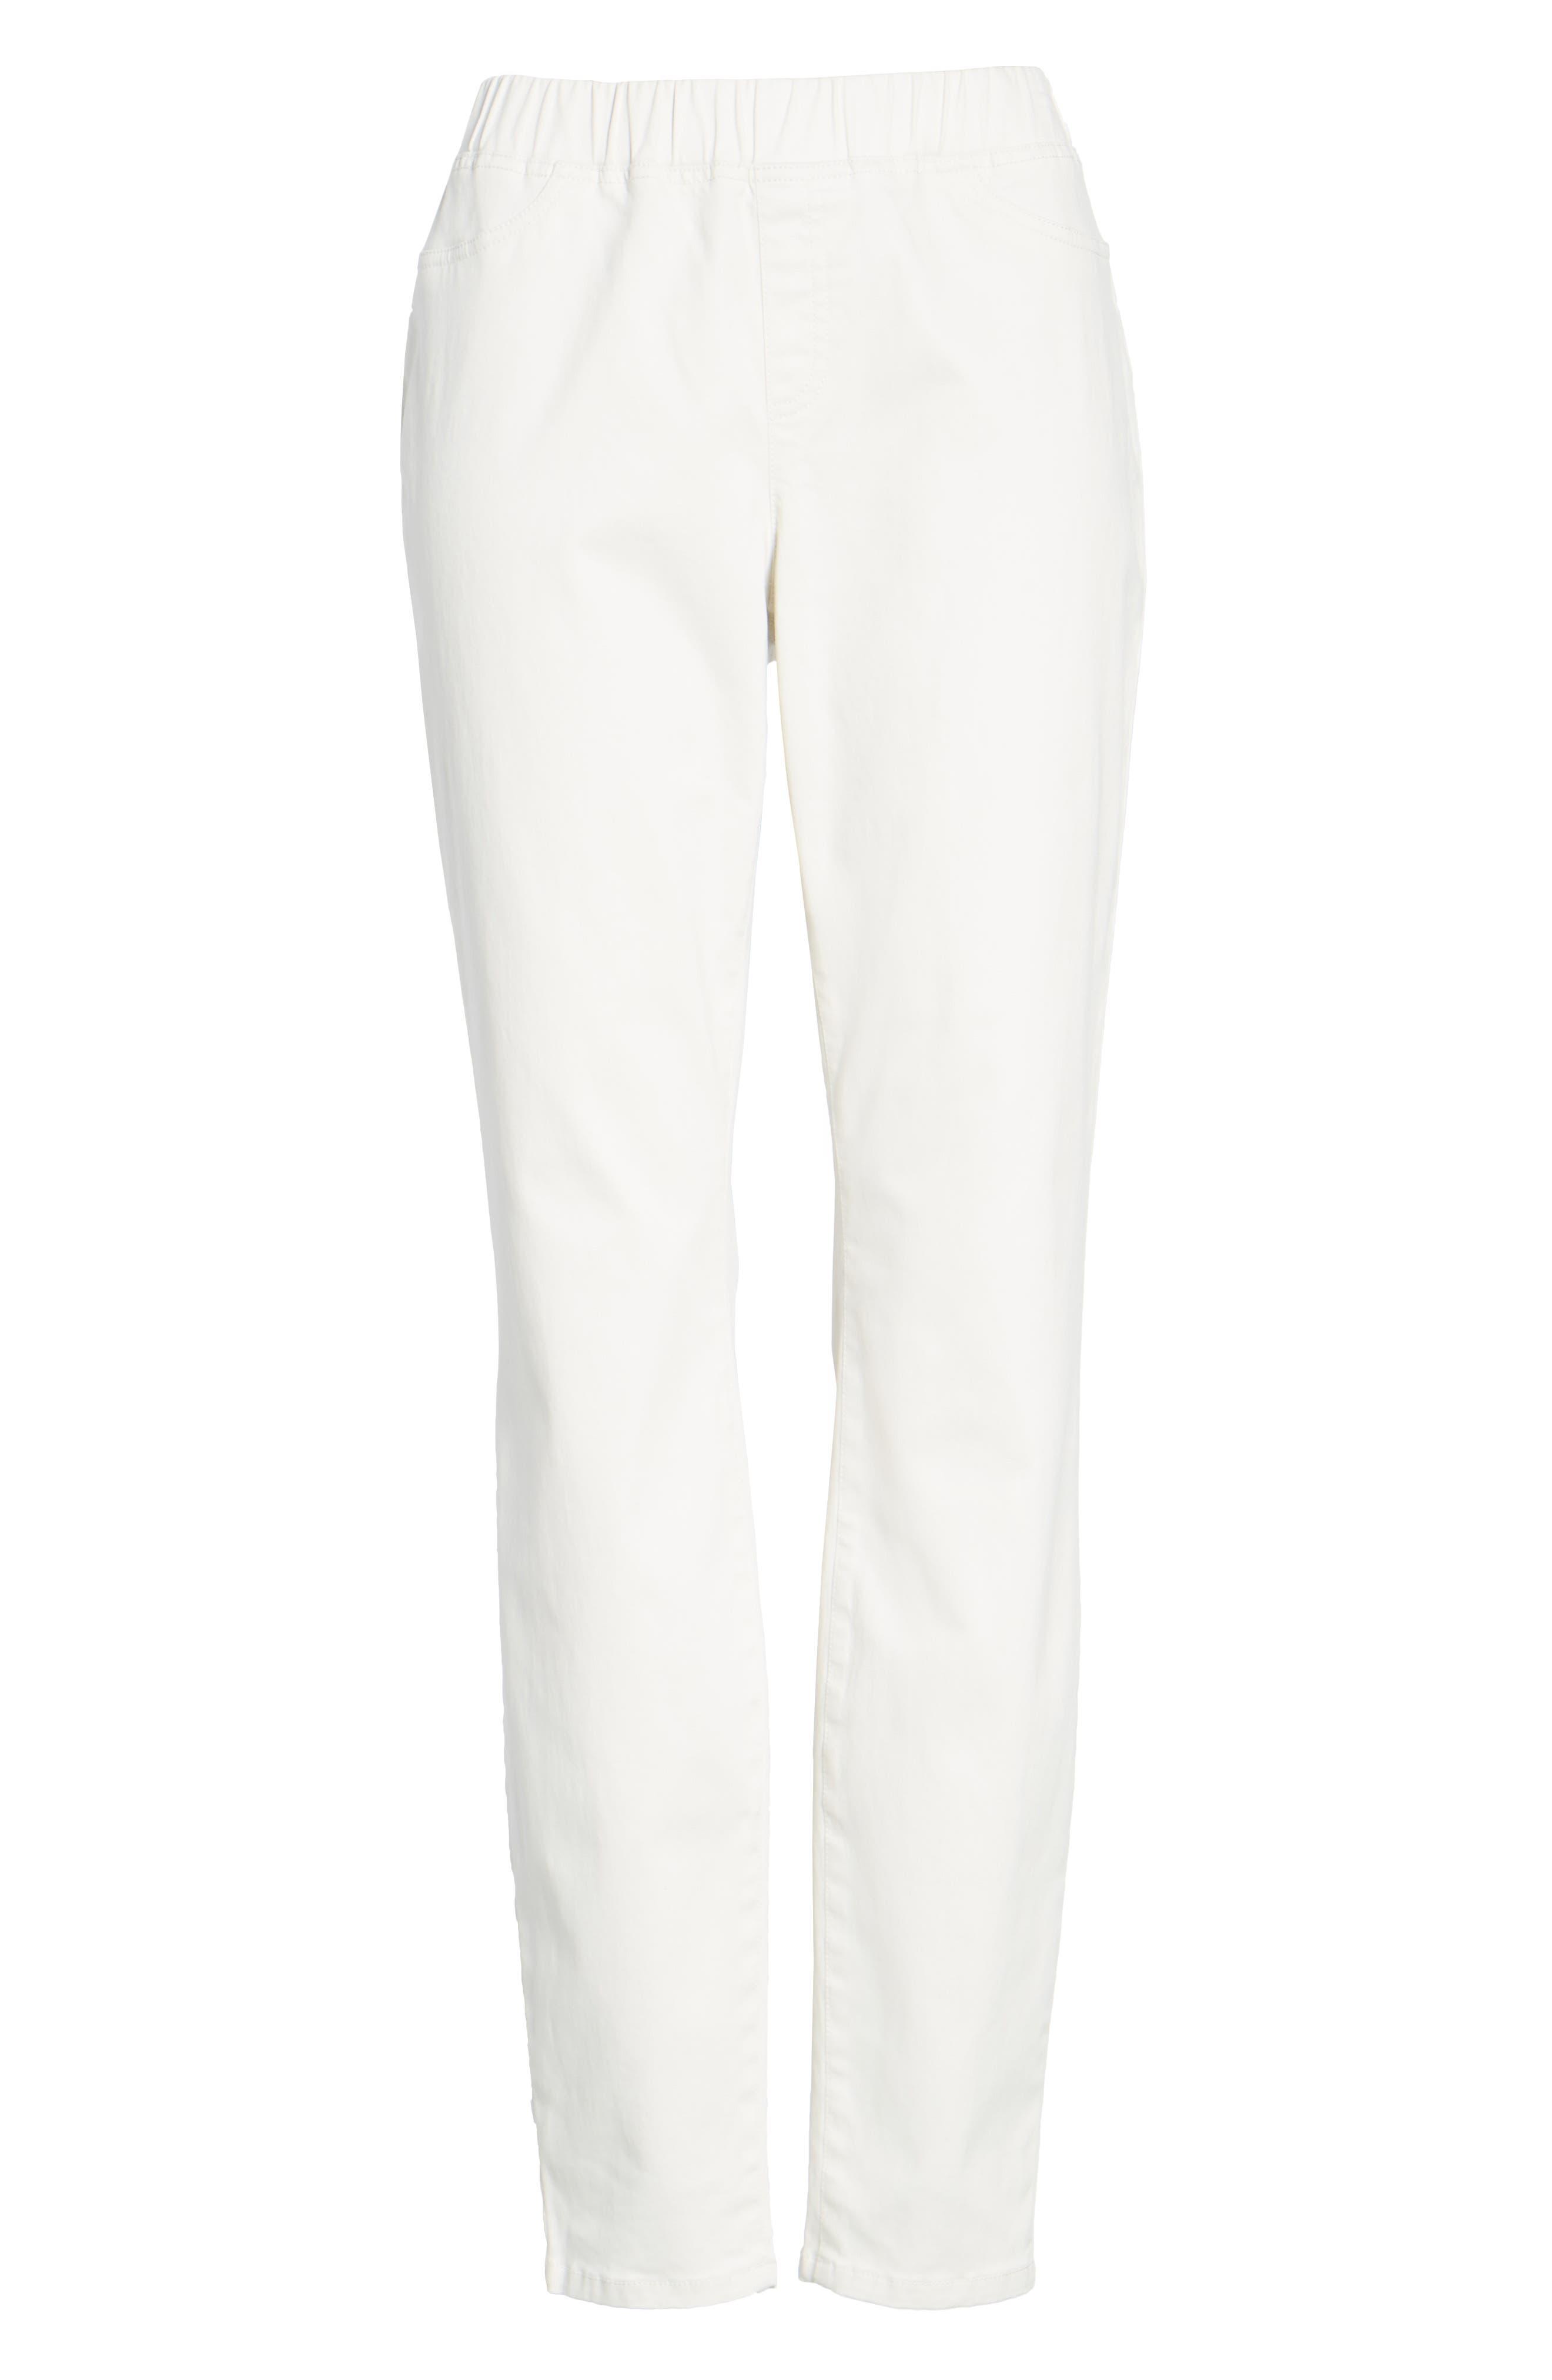 Stretch Organic Cotton Denim Skinny Pants,                             Alternate thumbnail 6, color,                             Bone